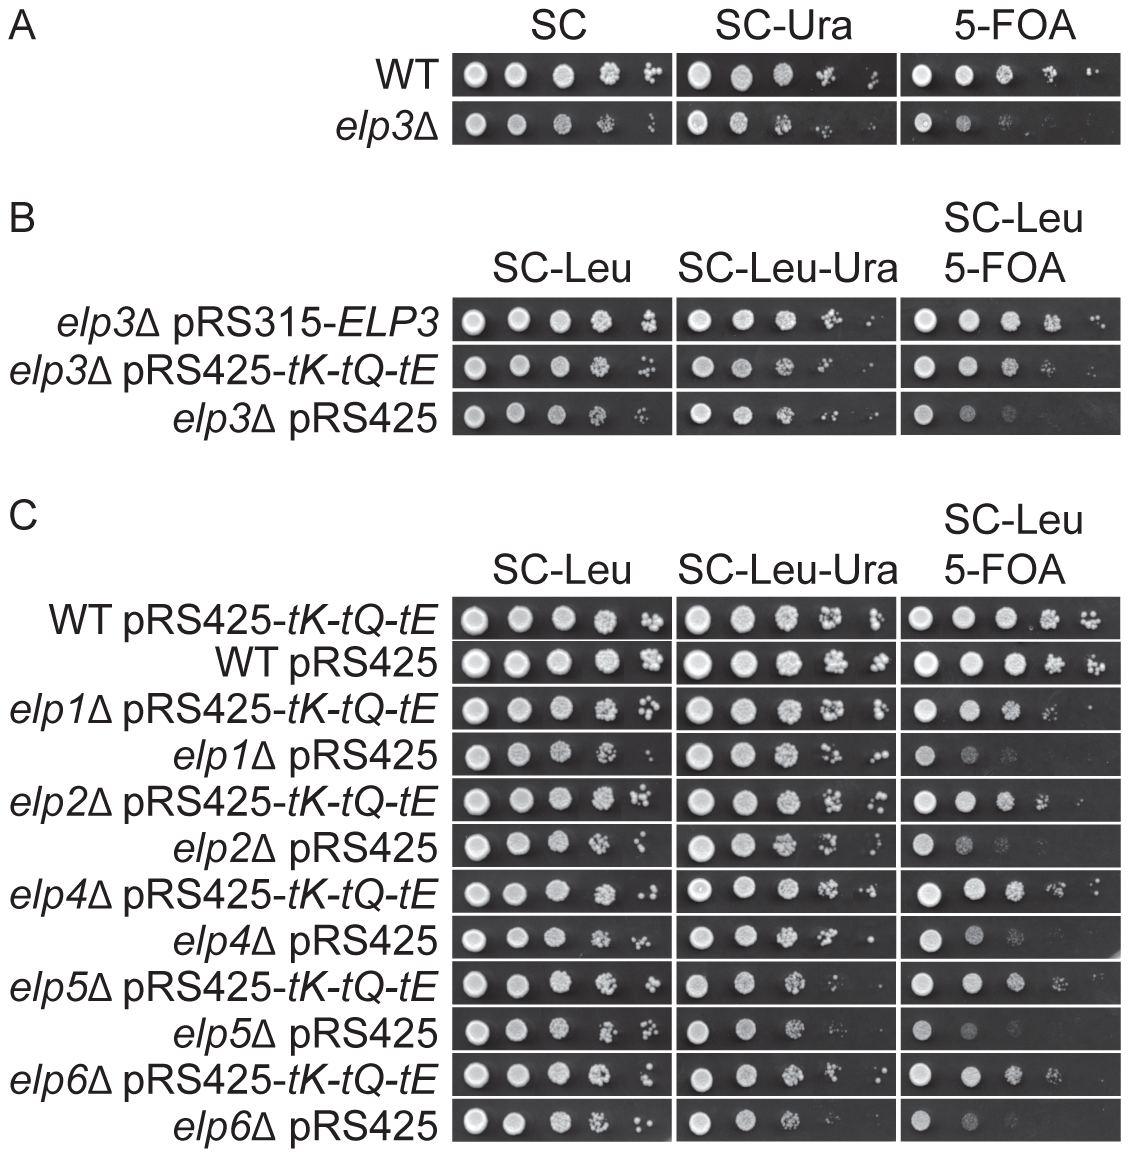 Increased levels of tRNA<sup>Lys</sup><sub>s<sup>2</sup></sub><sub>UUU</sub>, tRNA<sup>Gln</sup><sub>s<sup>2</sup></sub><sub>UUG</sub>, and tRNA<sup>Glu</sup><sub>s<sup>2</sup></sub><sub>UUC</sub> suppress the telomeric silencing defect of Elongator mutants.